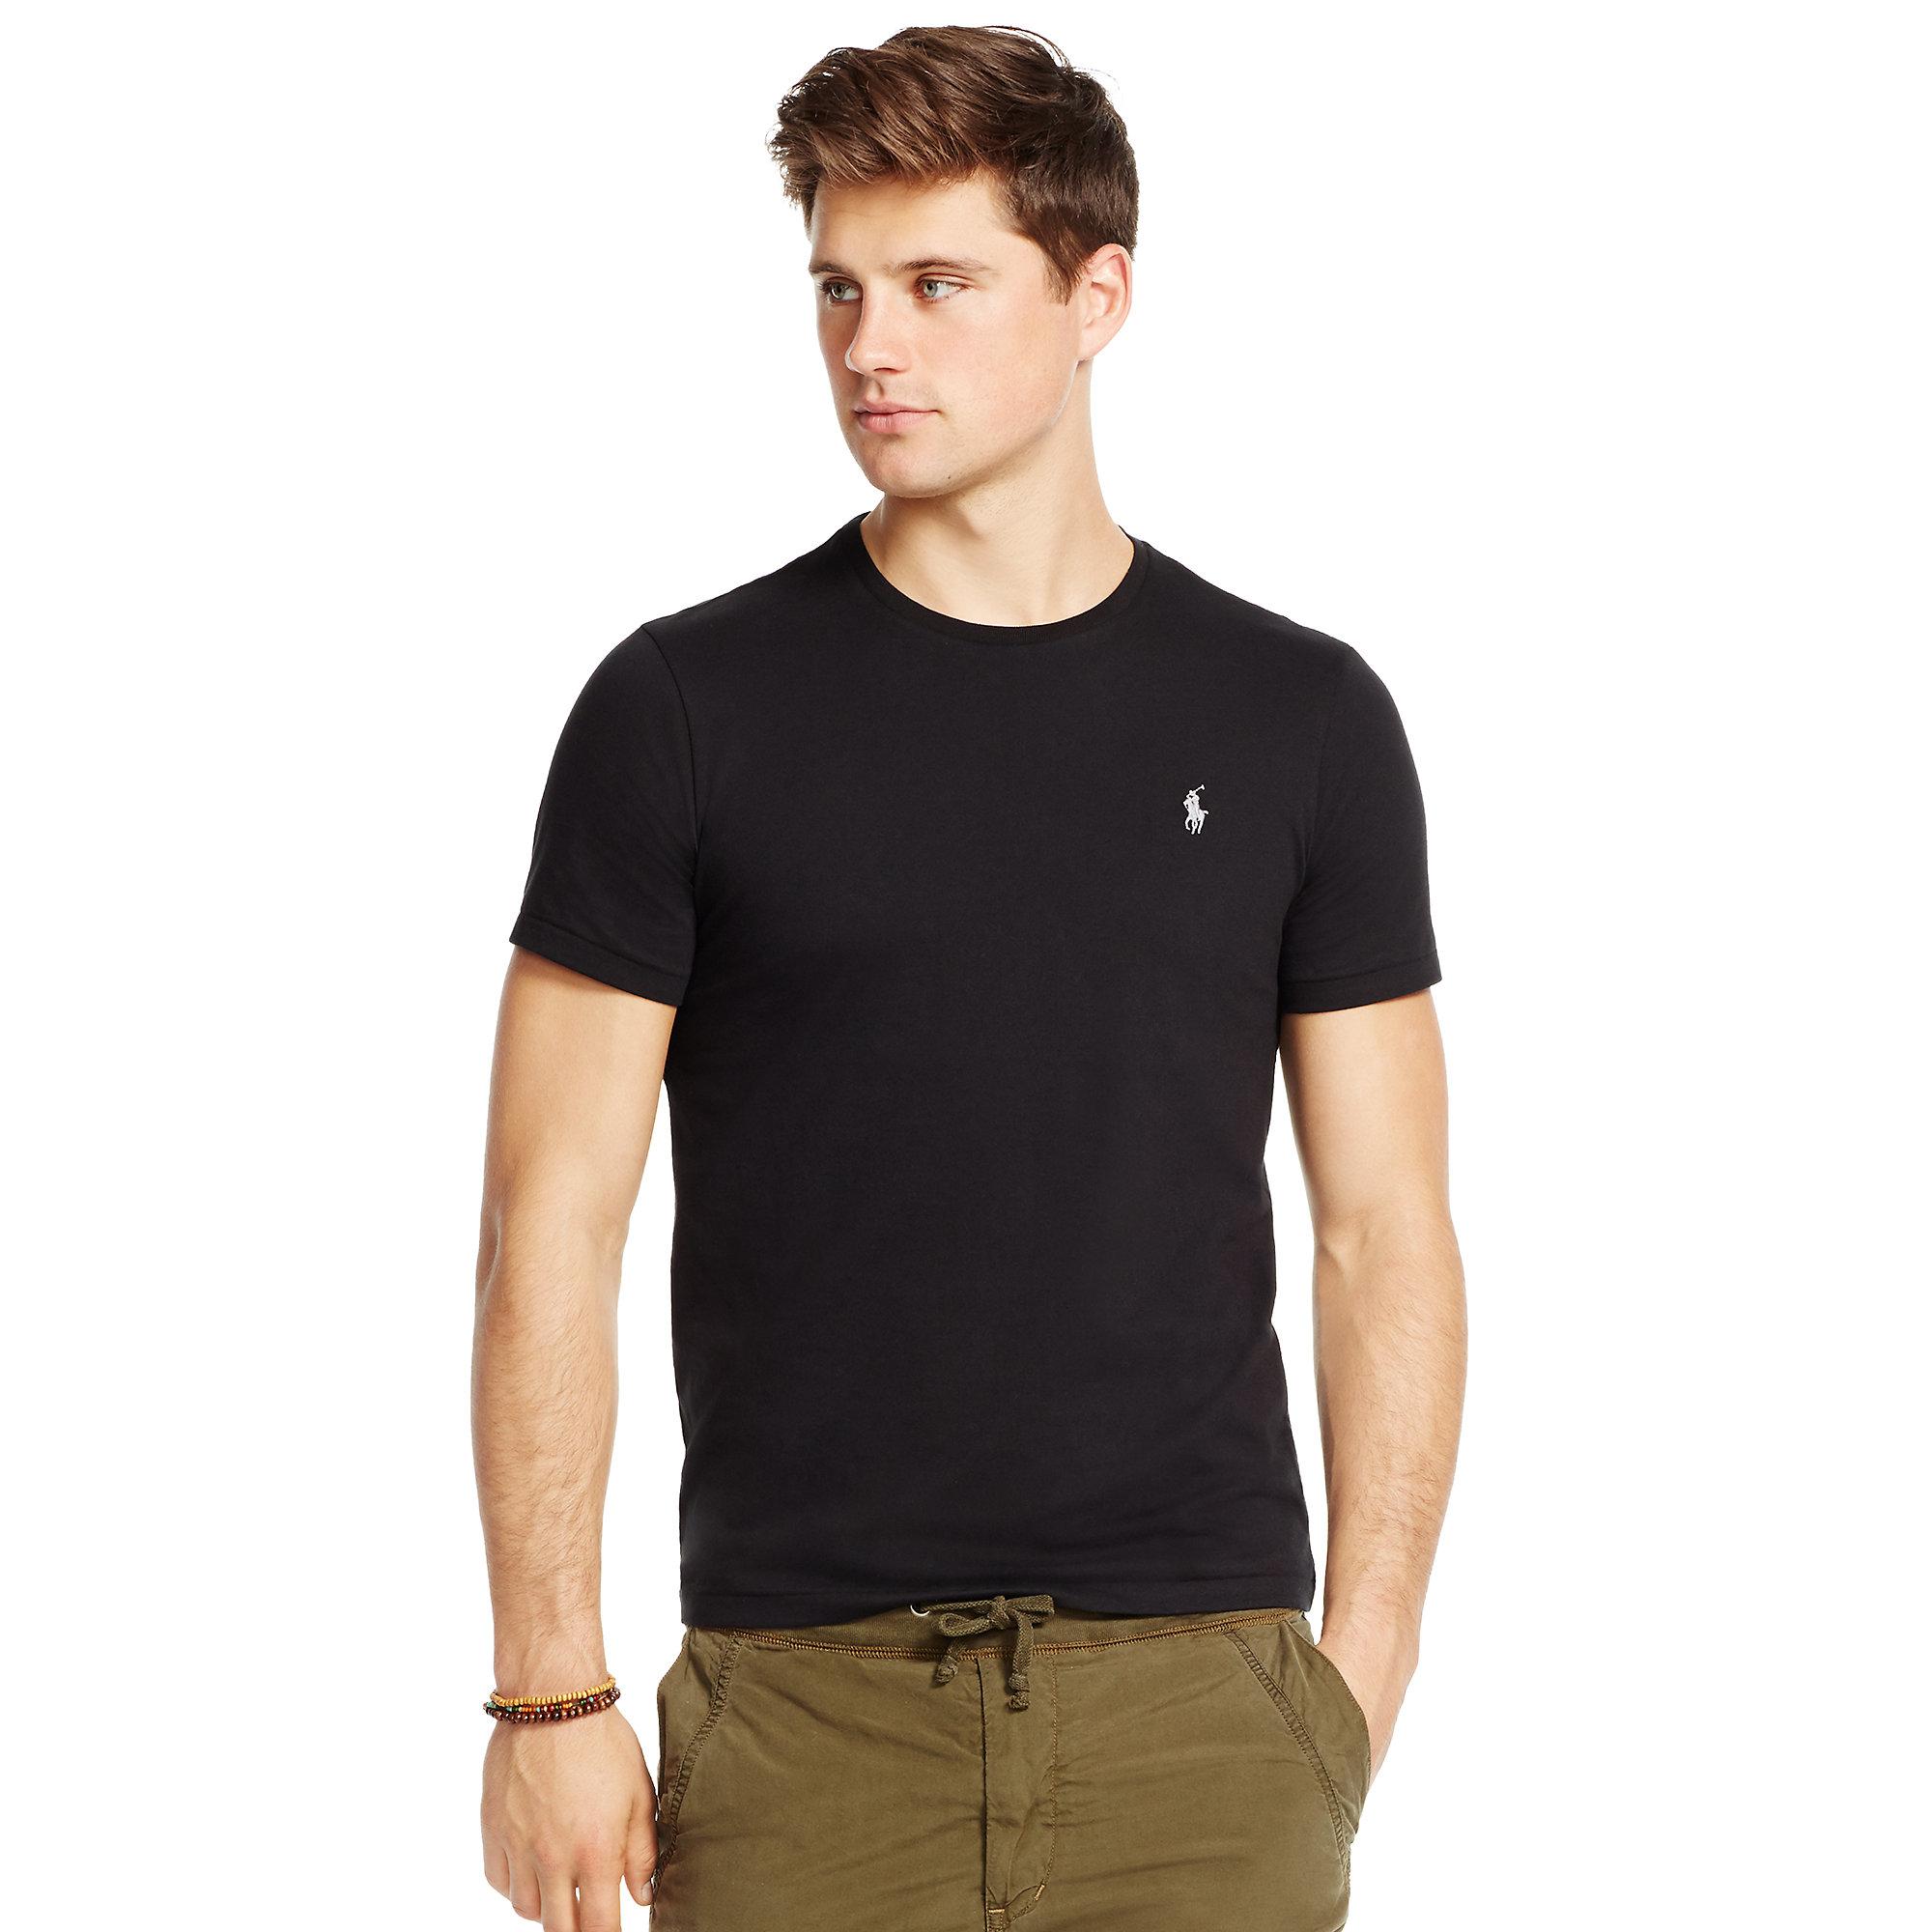 01b4c4f8226933 Lyst - Polo Ralph Lauren Custom-fit Cotton T-shirt in Black for Men